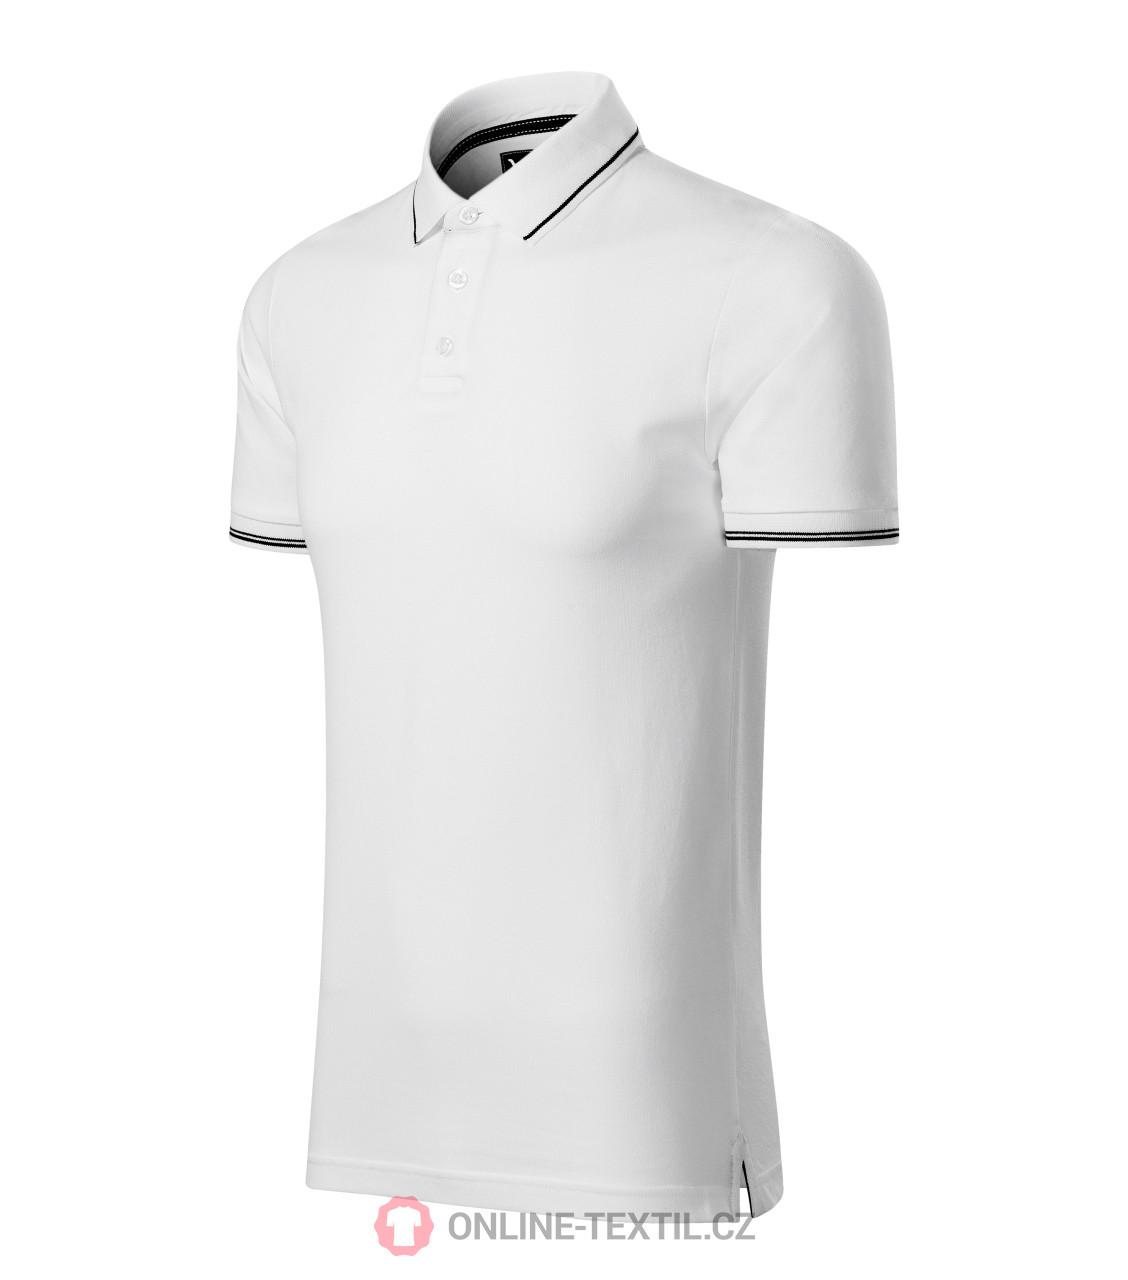 high quality polo shirts